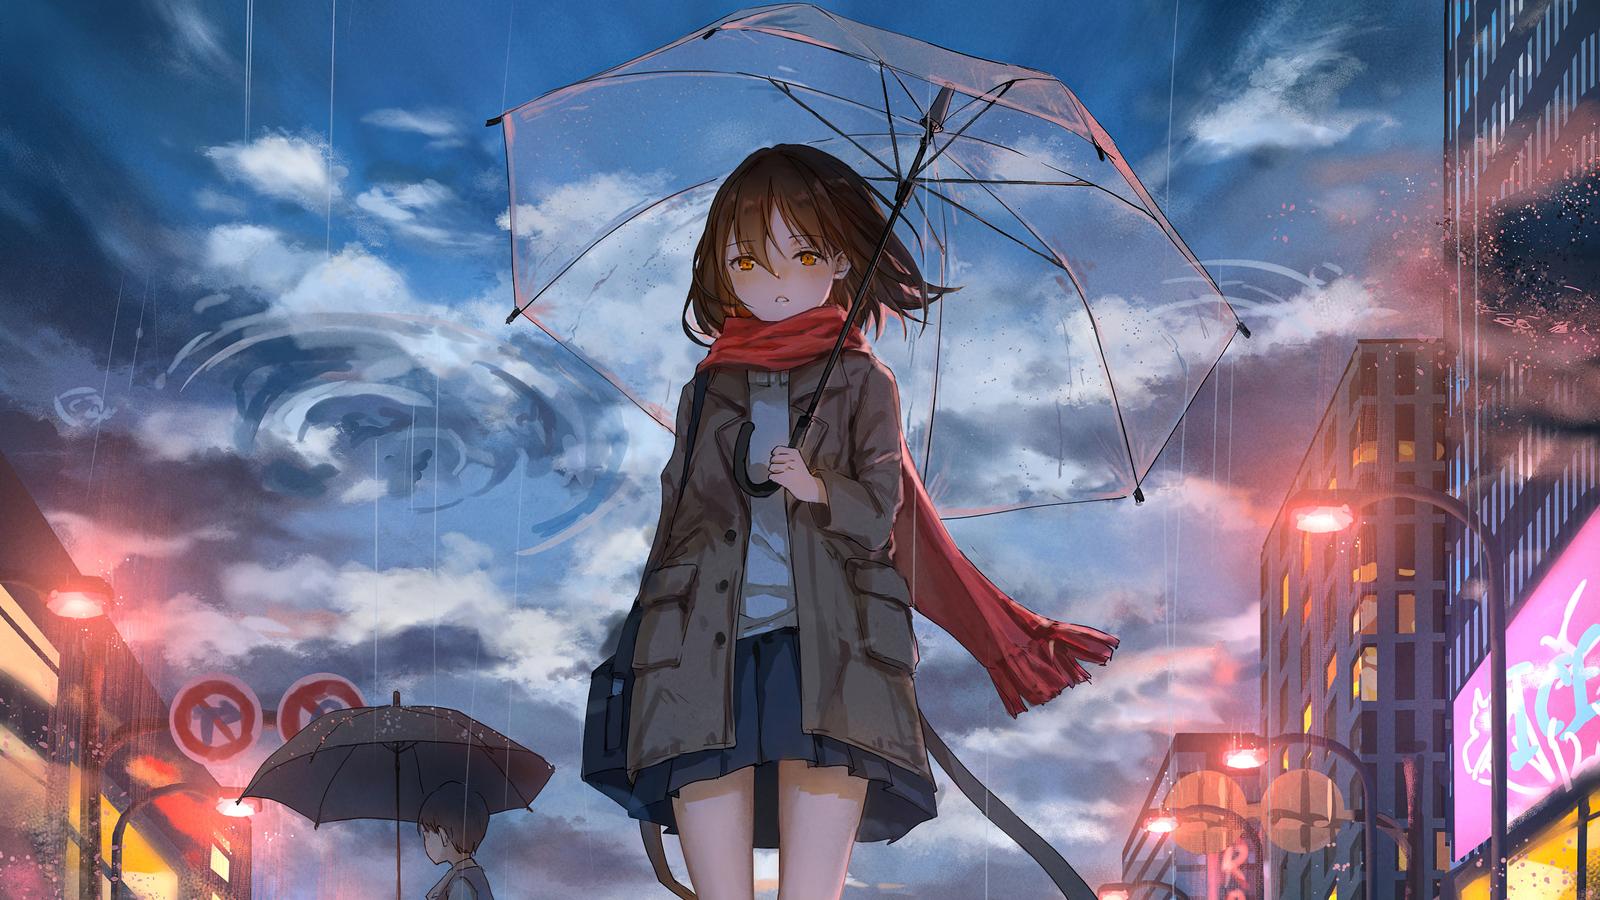 anime-girl-walking-in-rain-with-umbrella-4k-bj.jpg